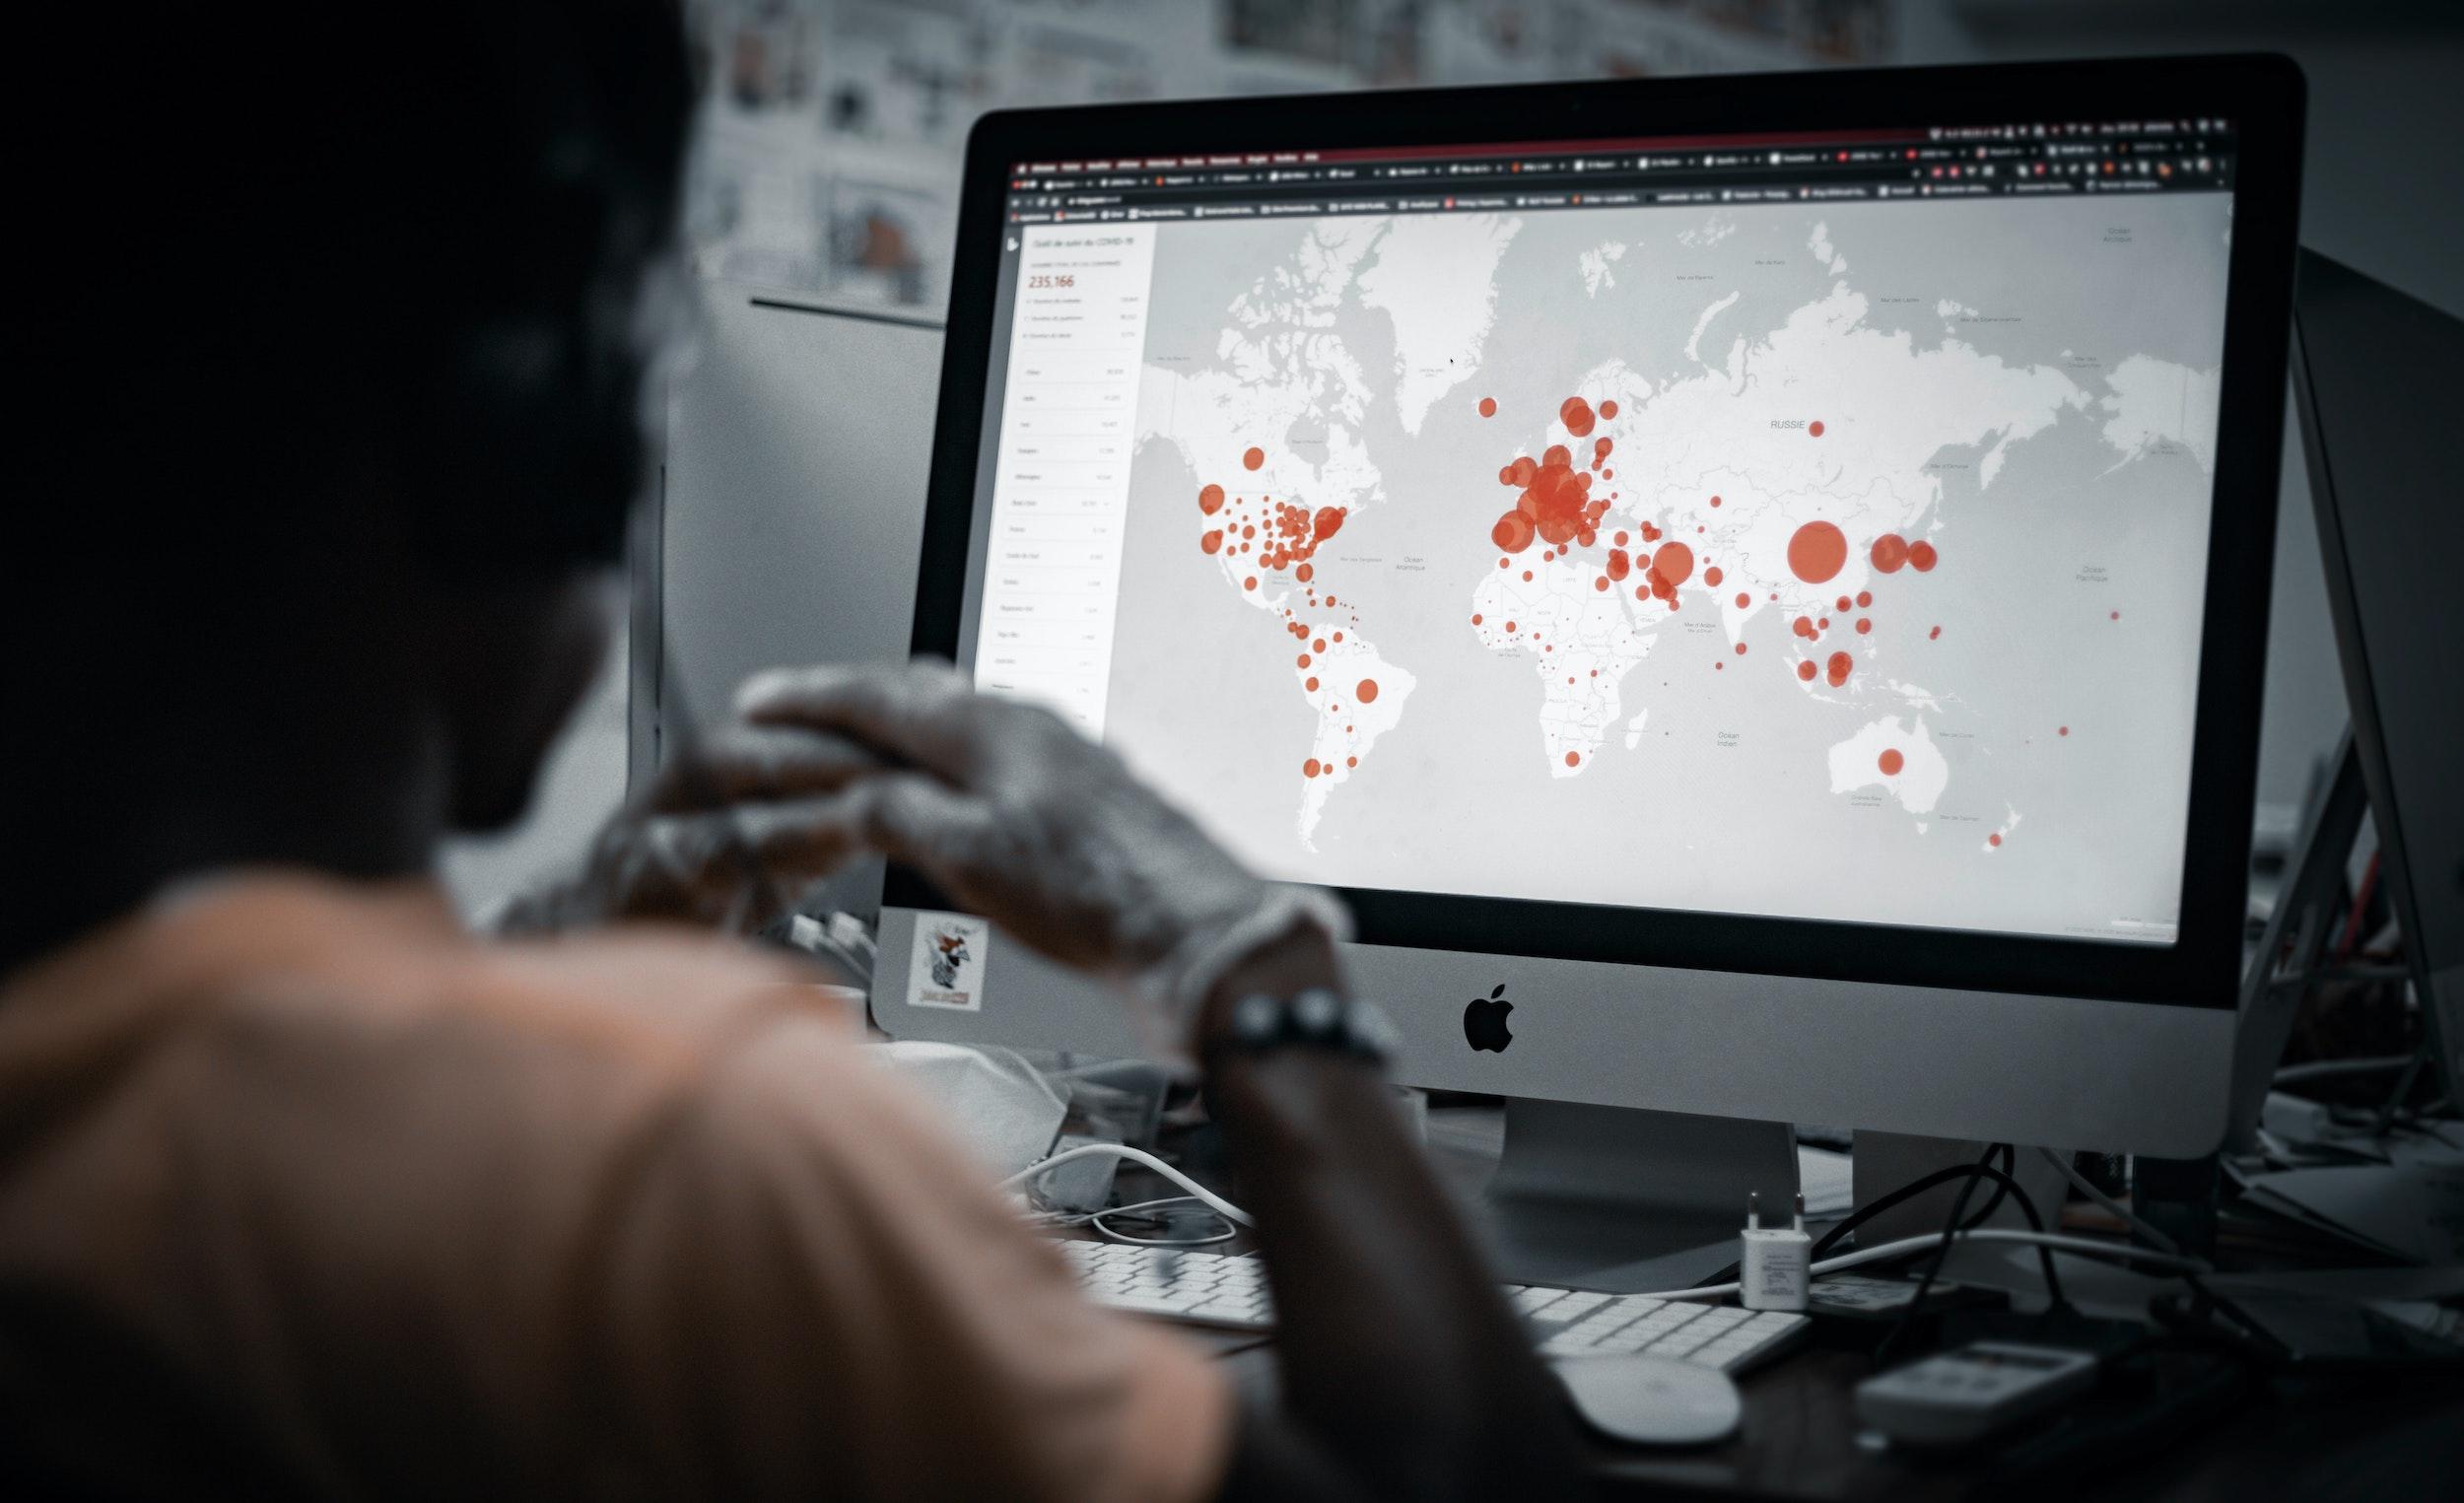 cyber attack cyberattack cyber